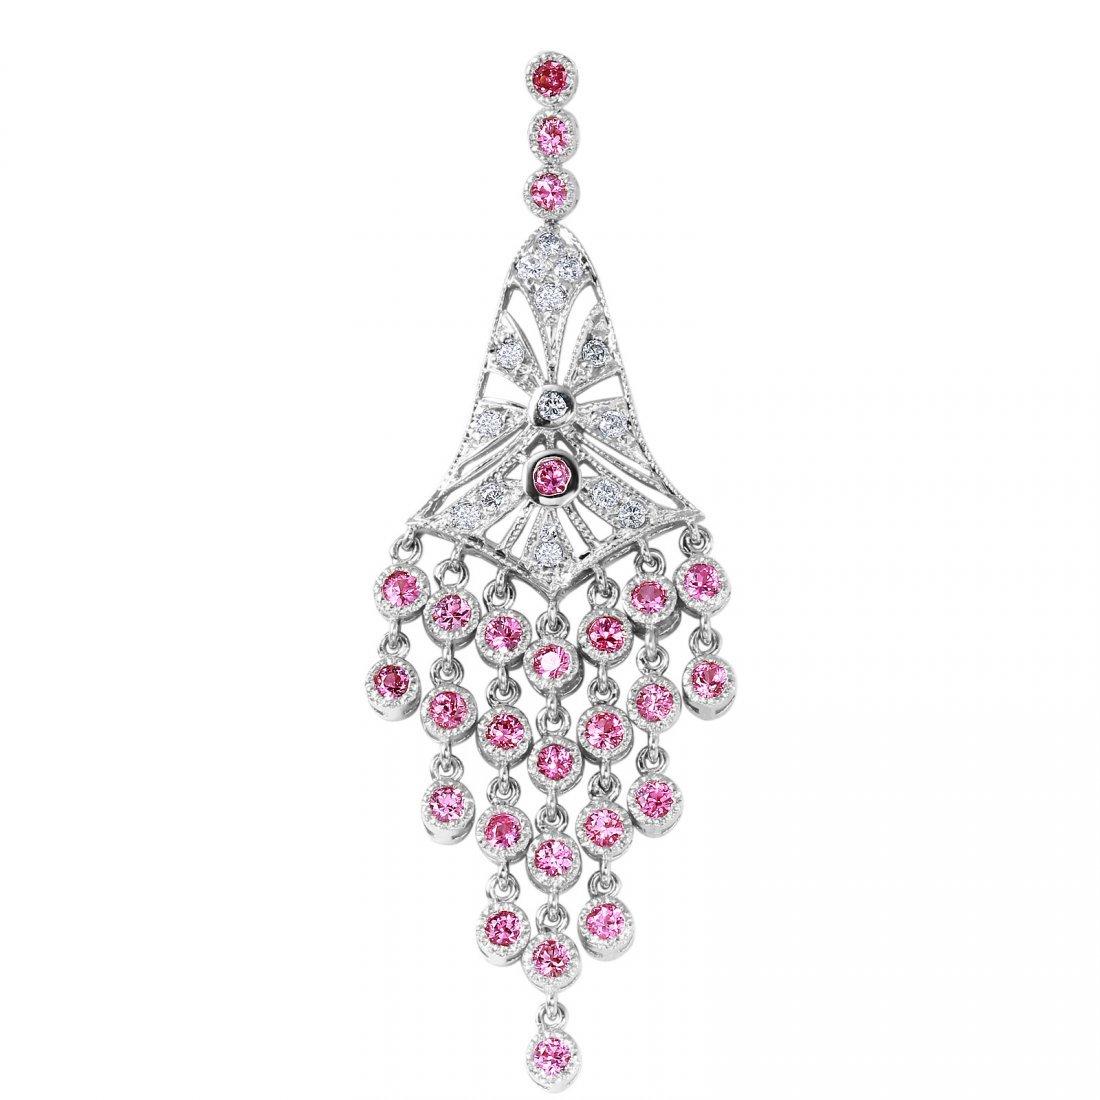 14KT White Gold Sapphire and Diamond Pendant - #2032